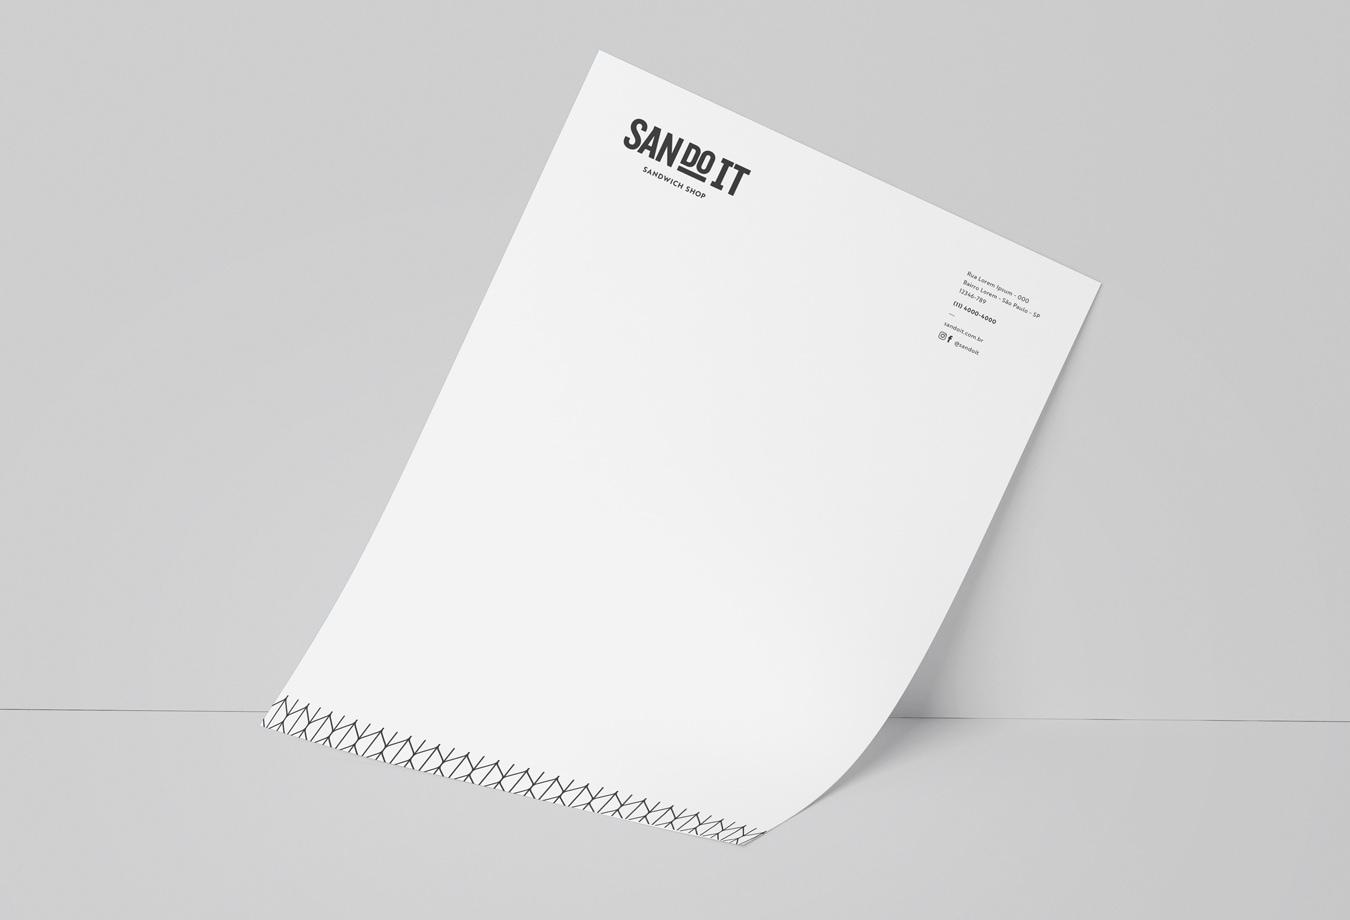 07-sandoit-visualidentity